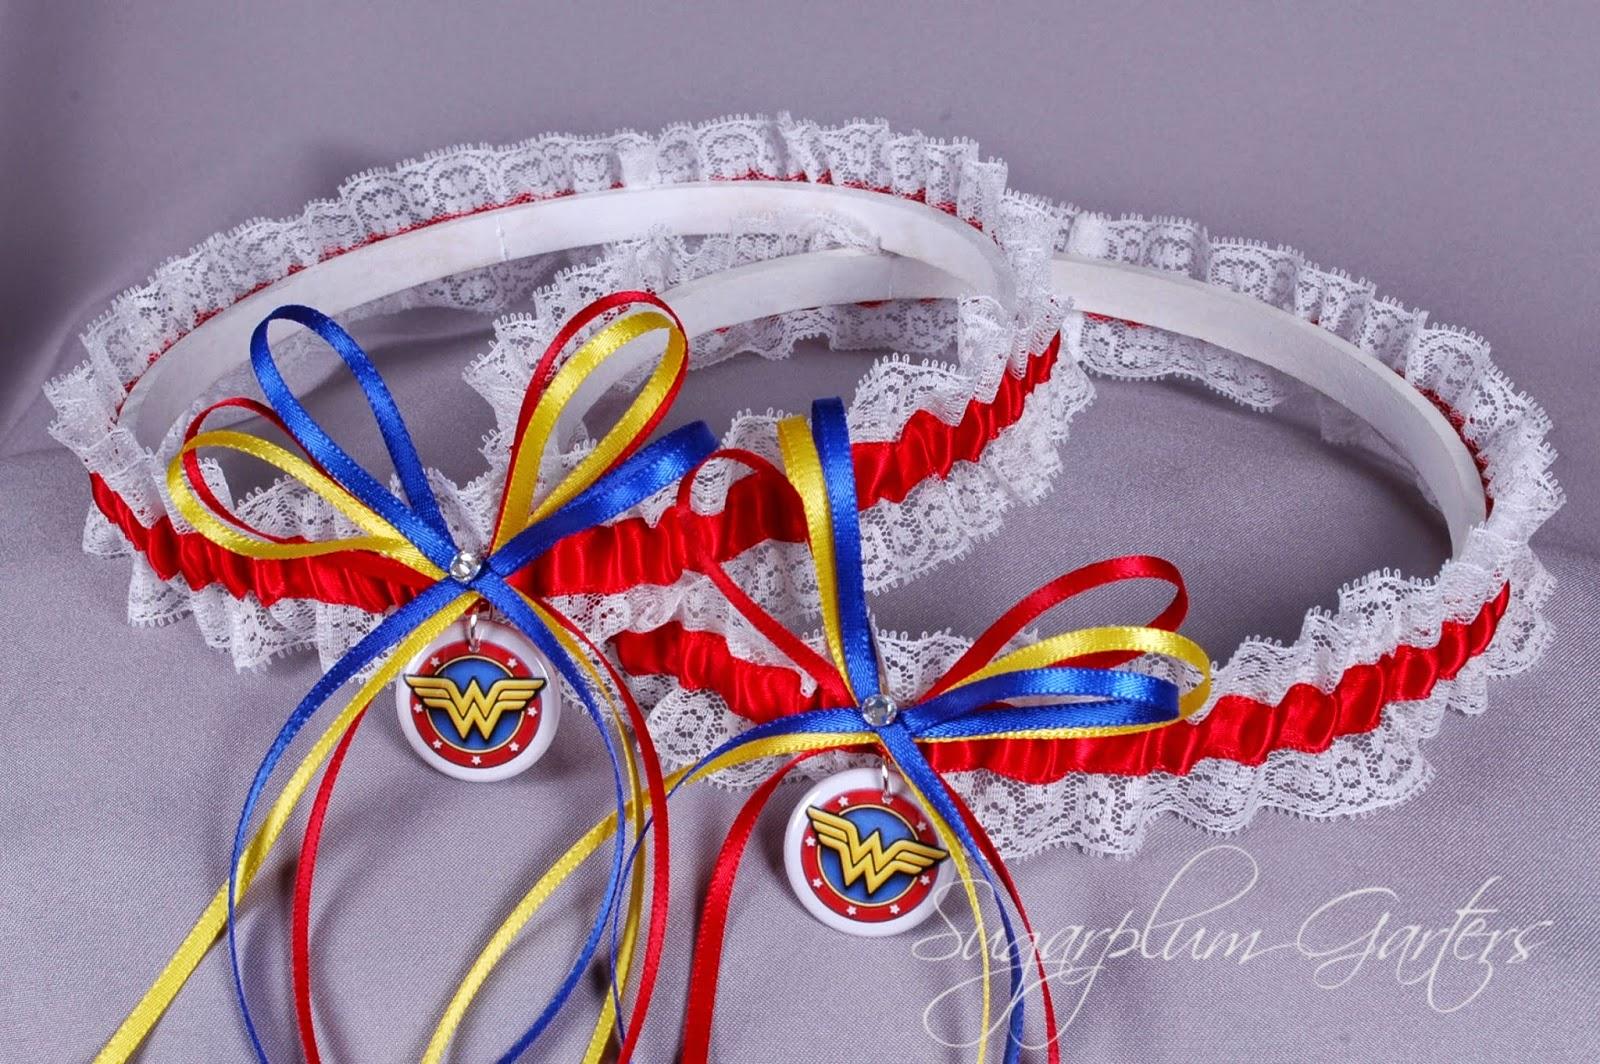 Wonder Woman Lace Wedding Garter Set by Sugarplum Garters